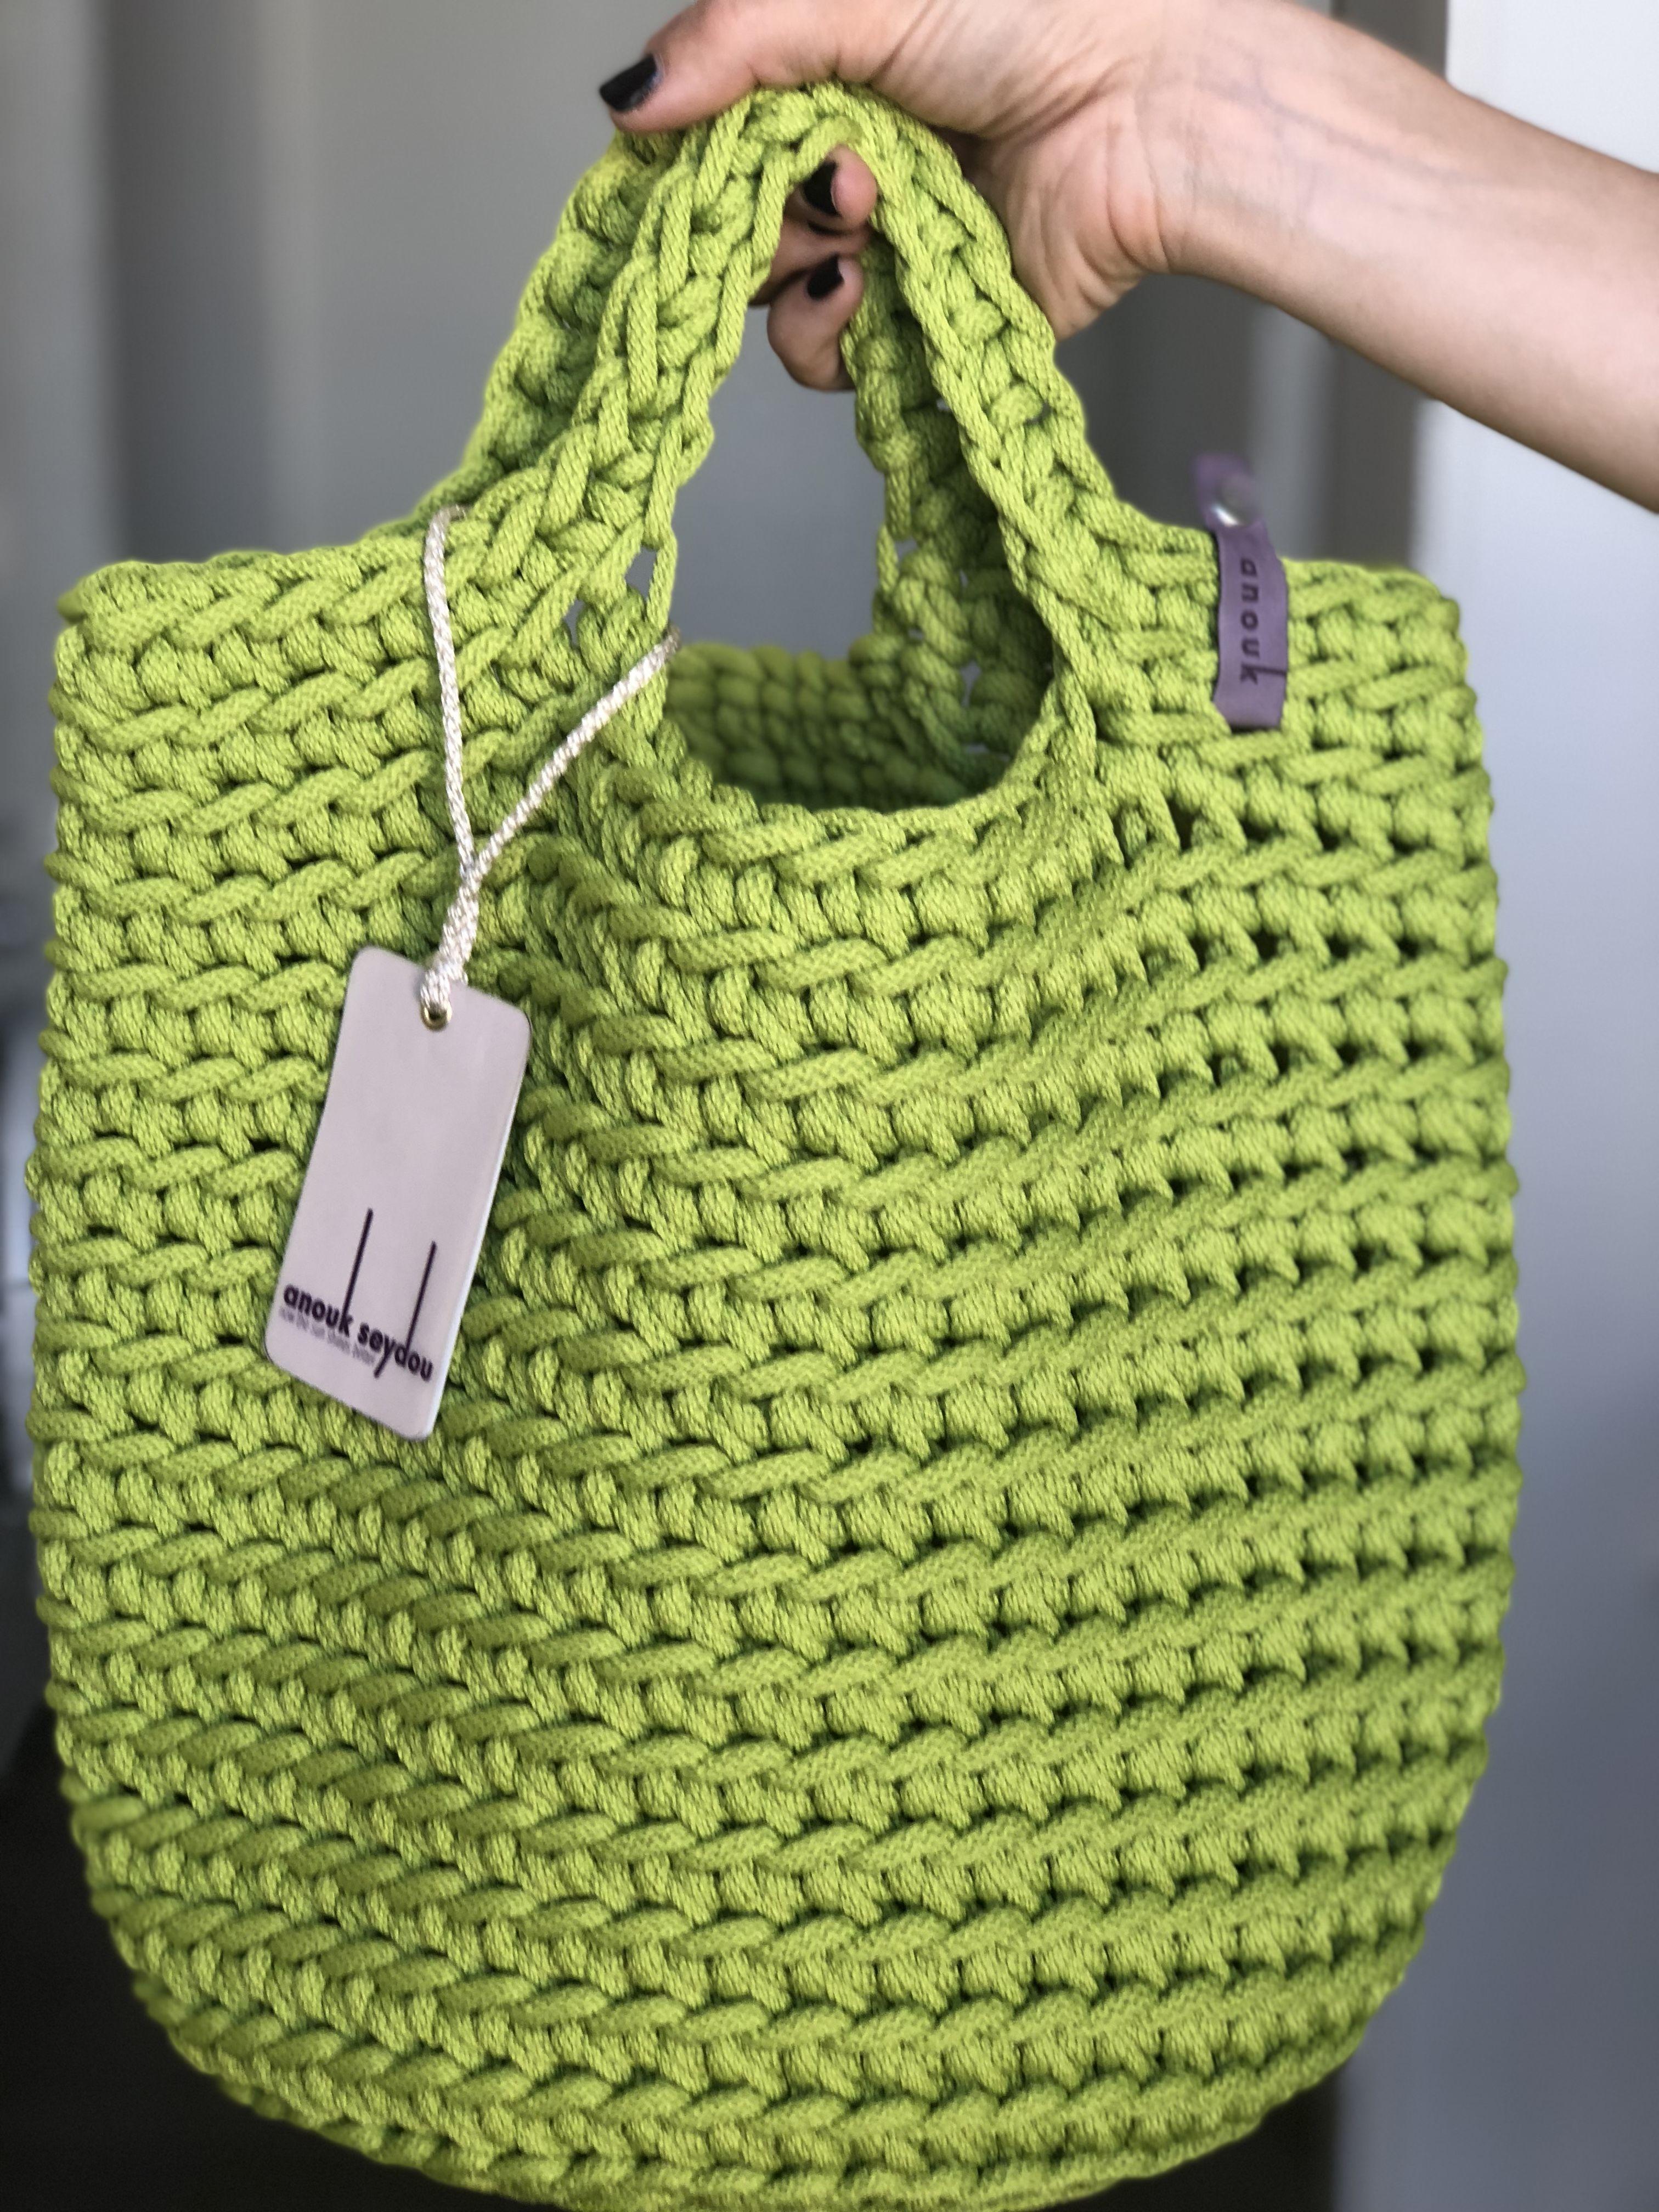 Scandinavian Style Crochet Handbag #crochethandbags